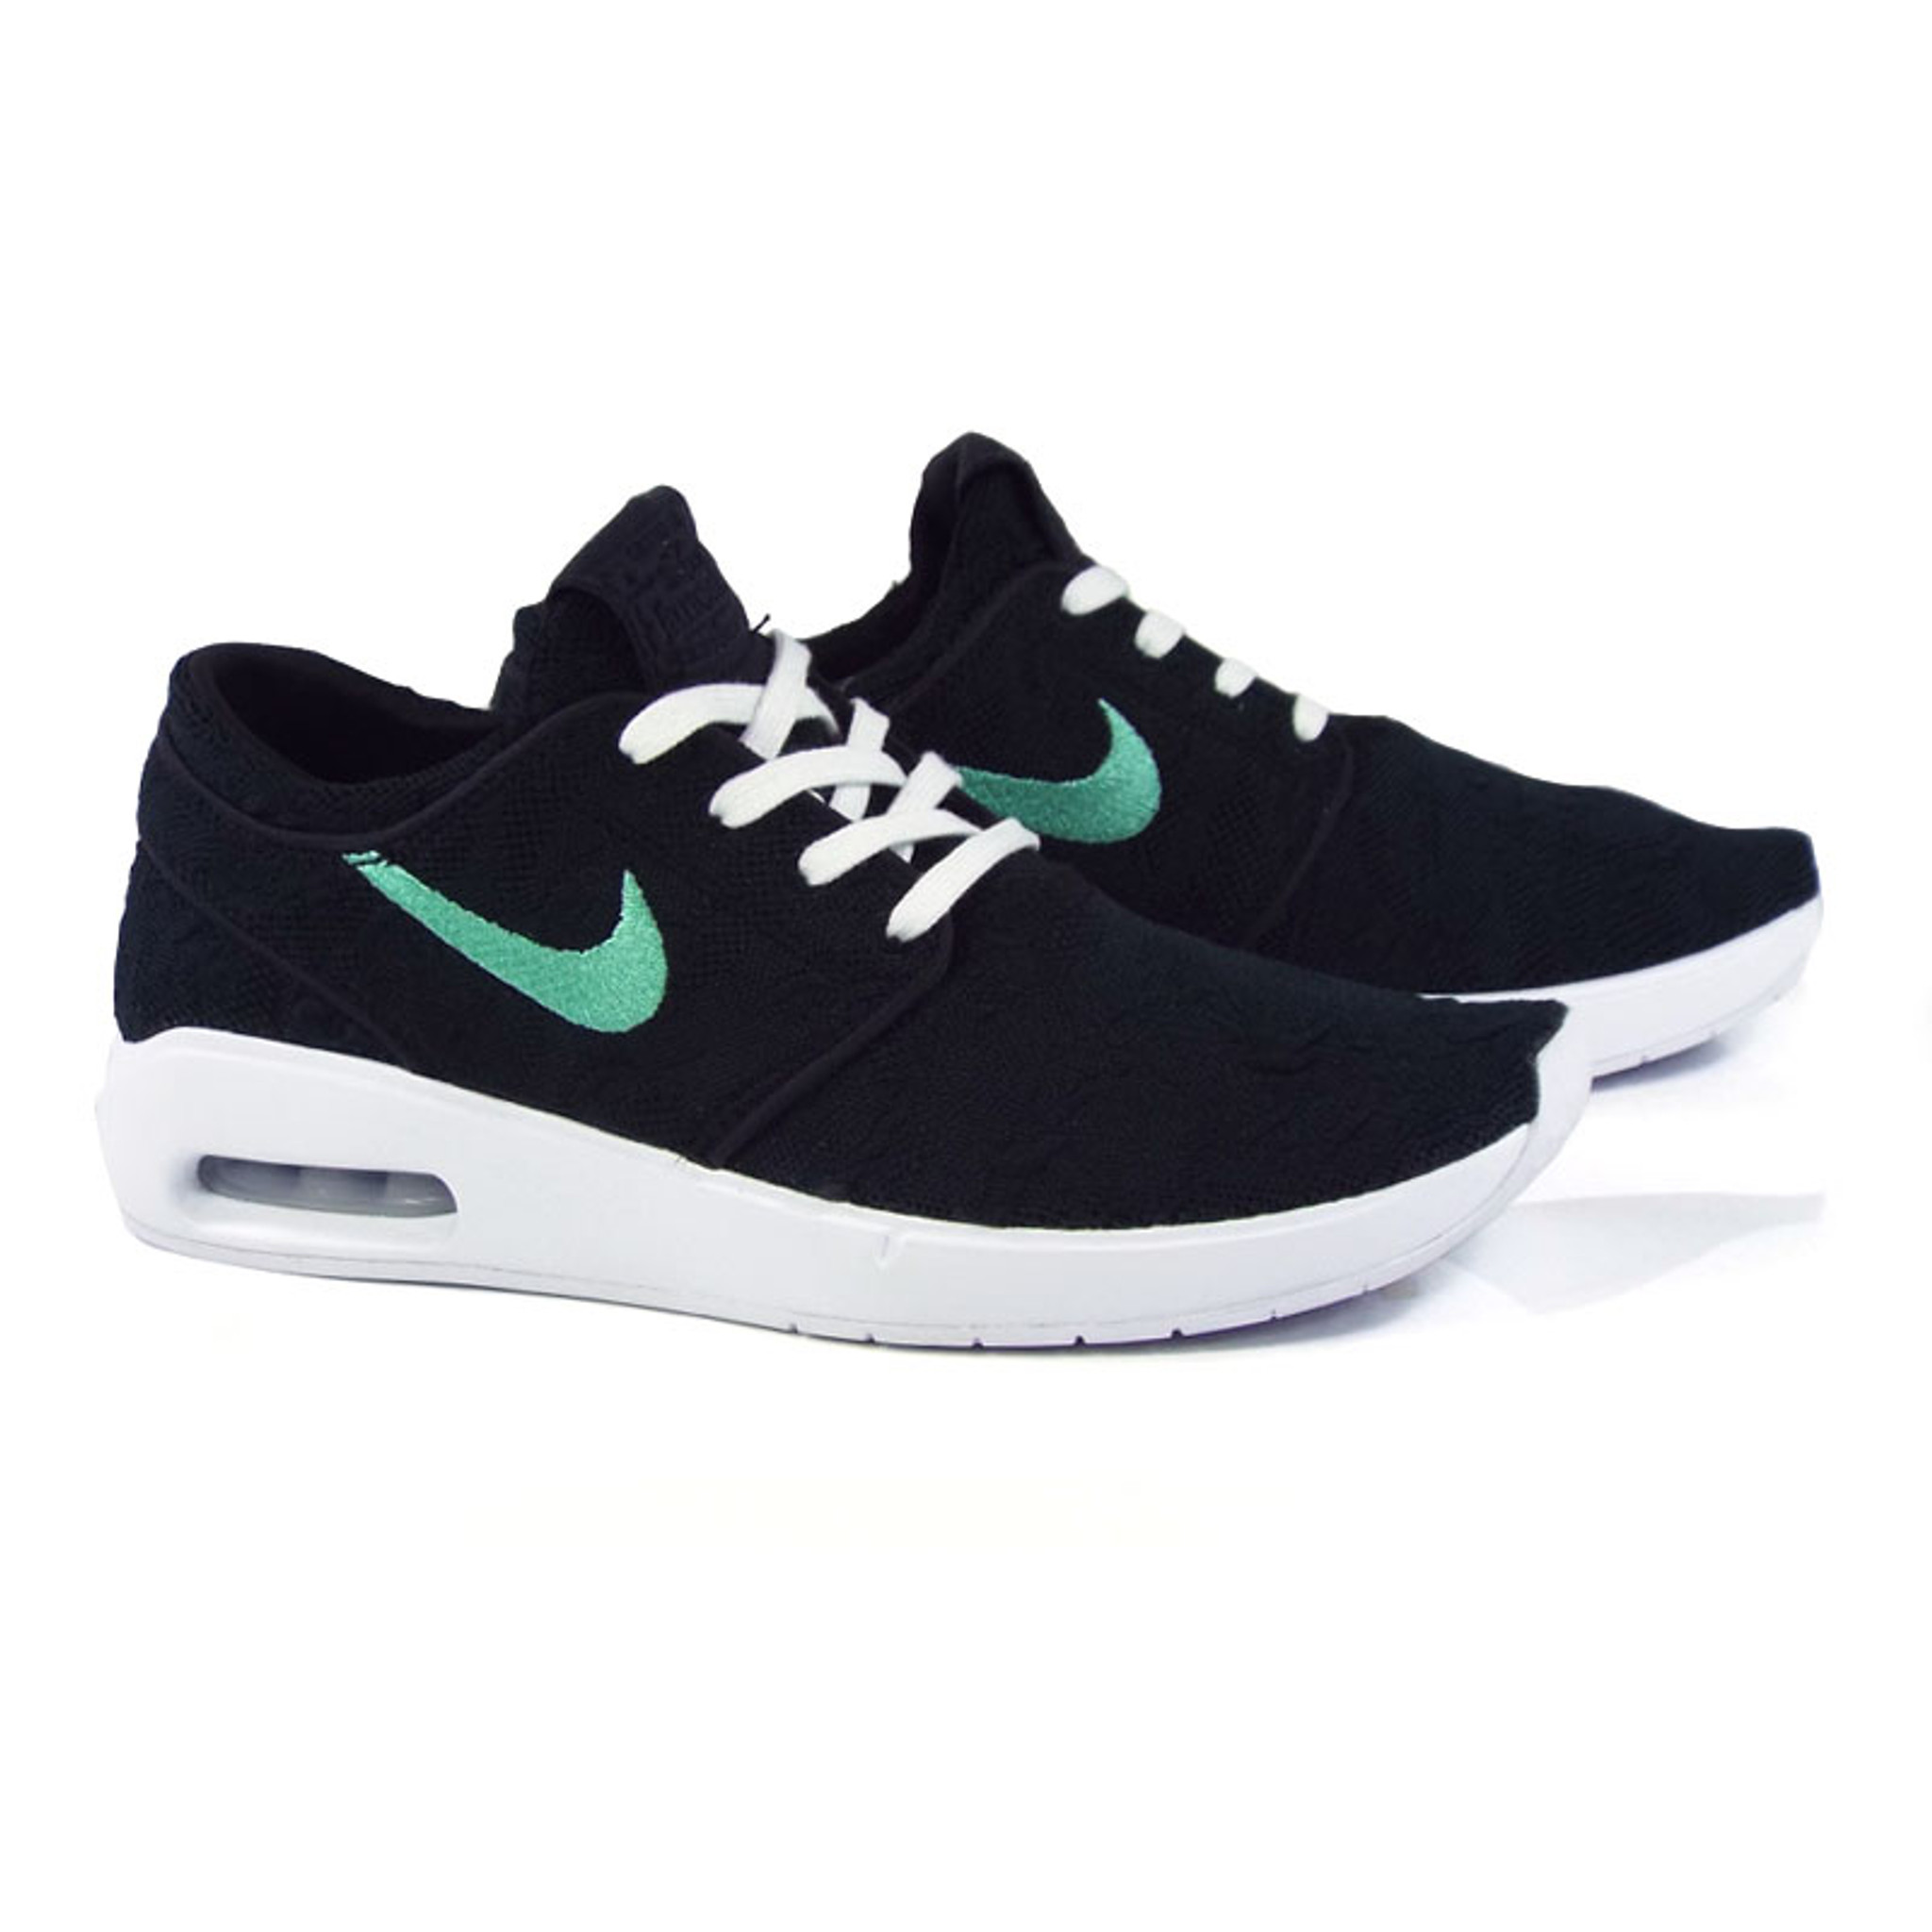 rencontrer cfec0 e6f8a Nike SB Janoski Air Max 2 Shoes - Black/Mint-Black